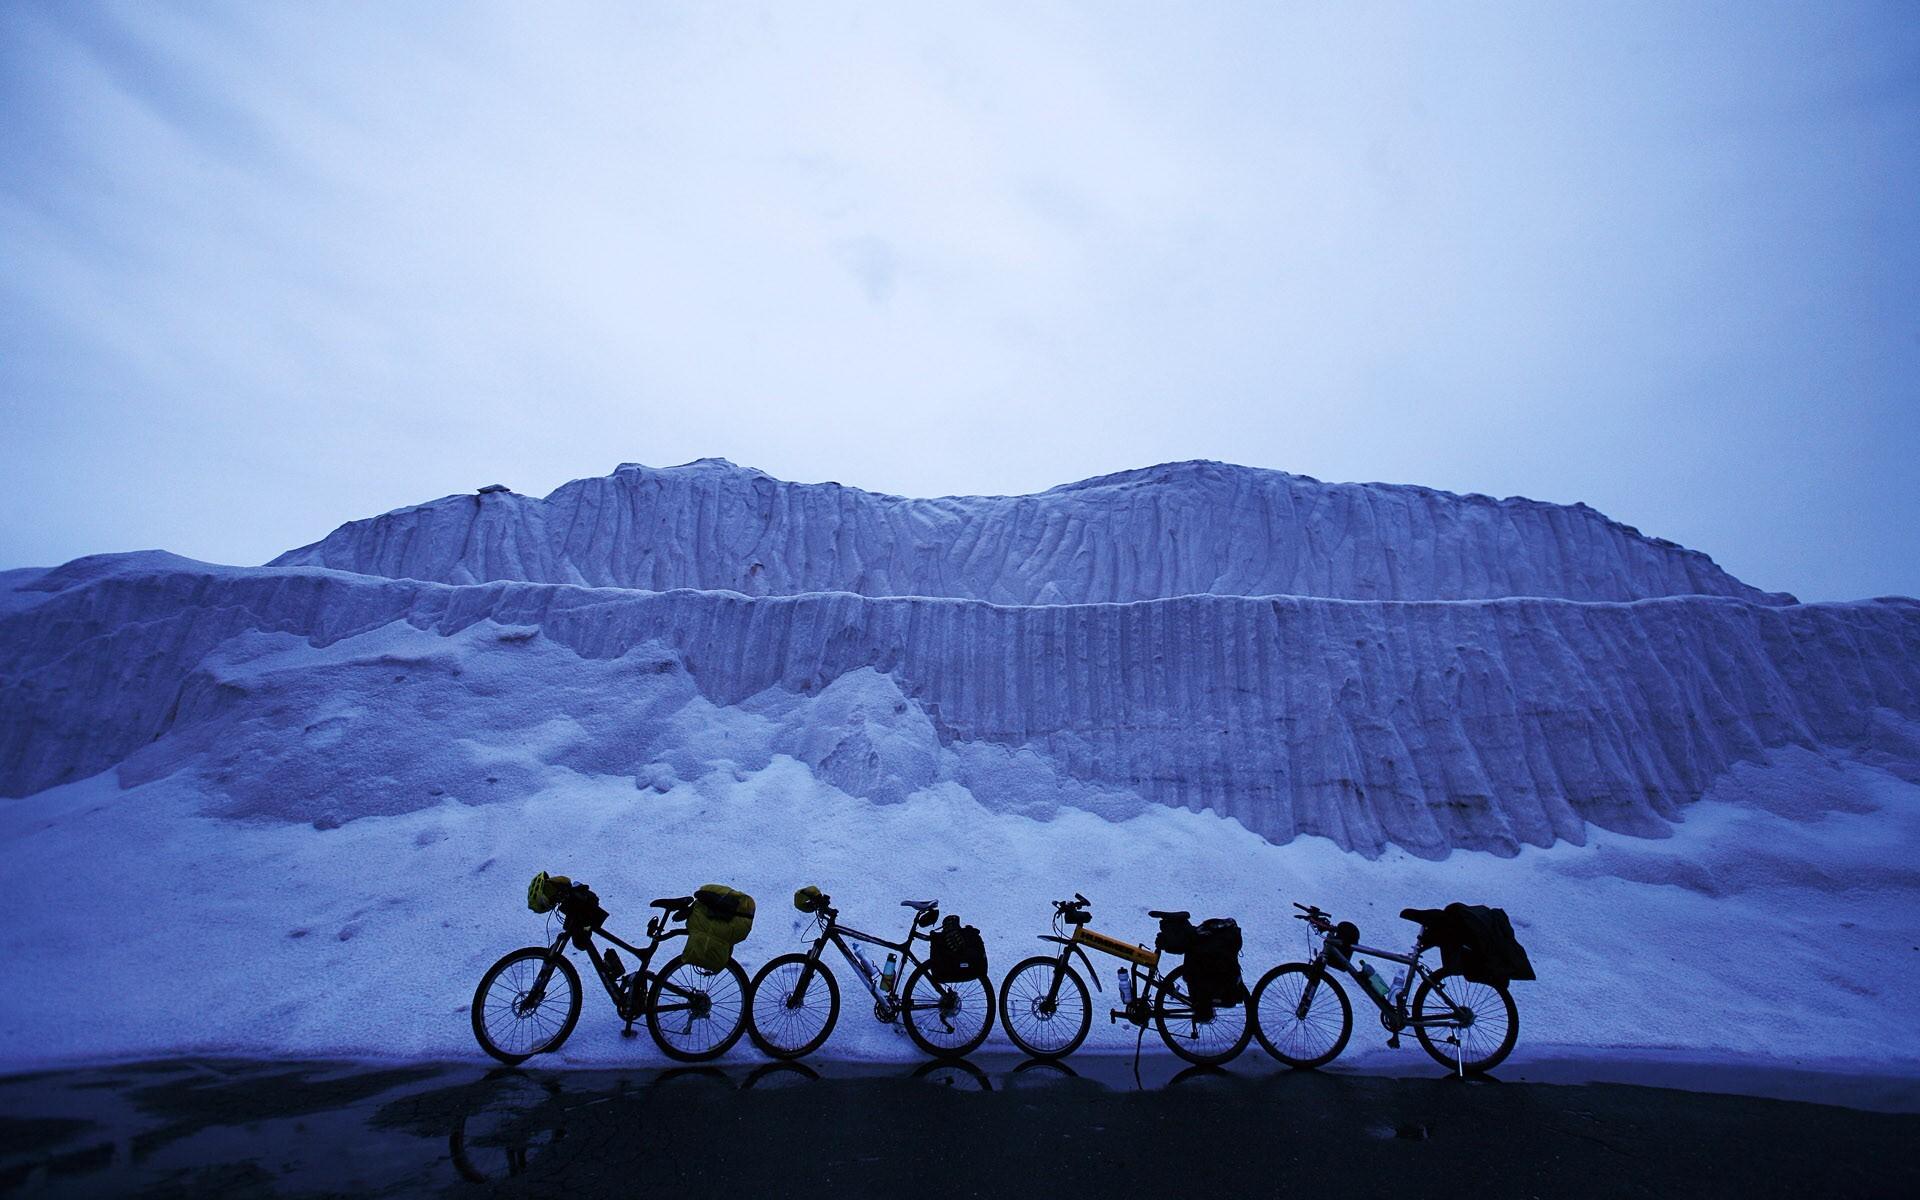 Cycle In Winter Season Photo